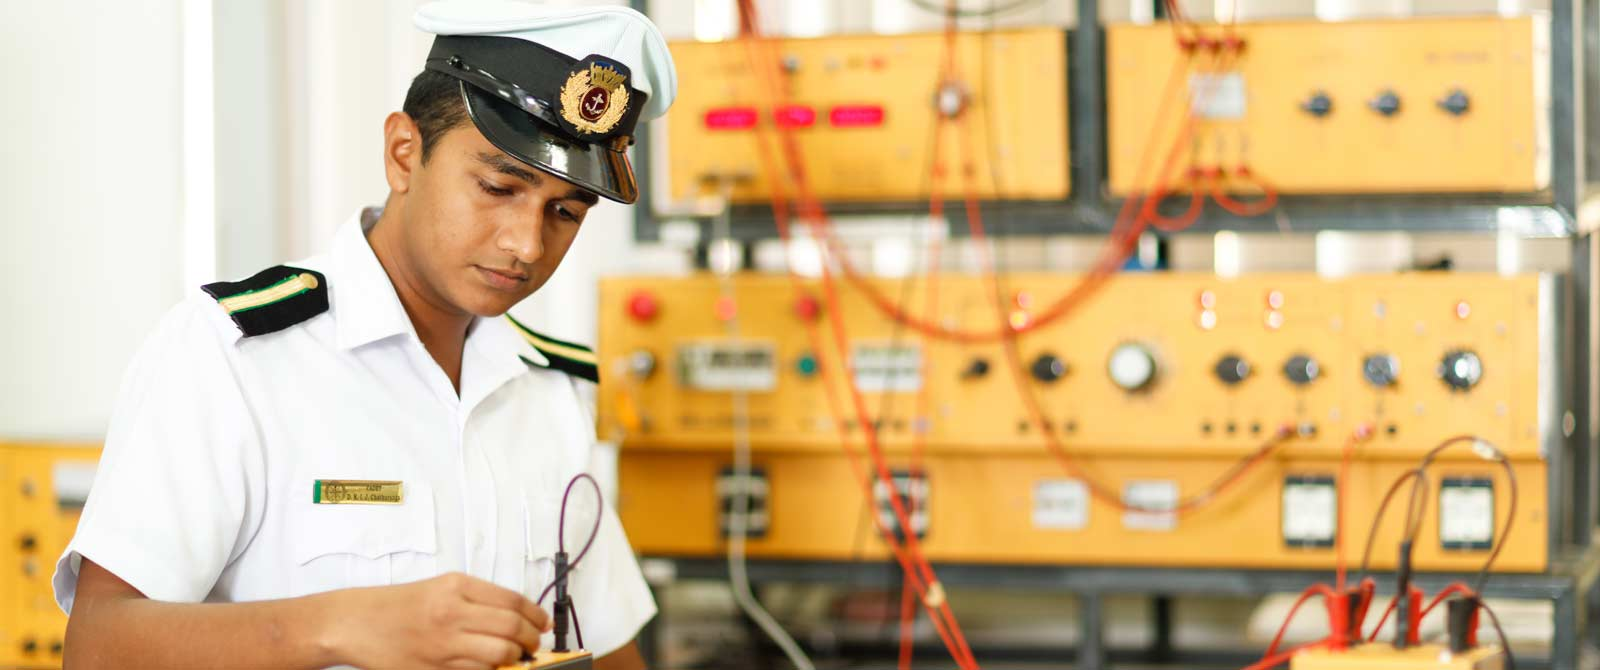 dept-of-marine-electrical-engineering-02